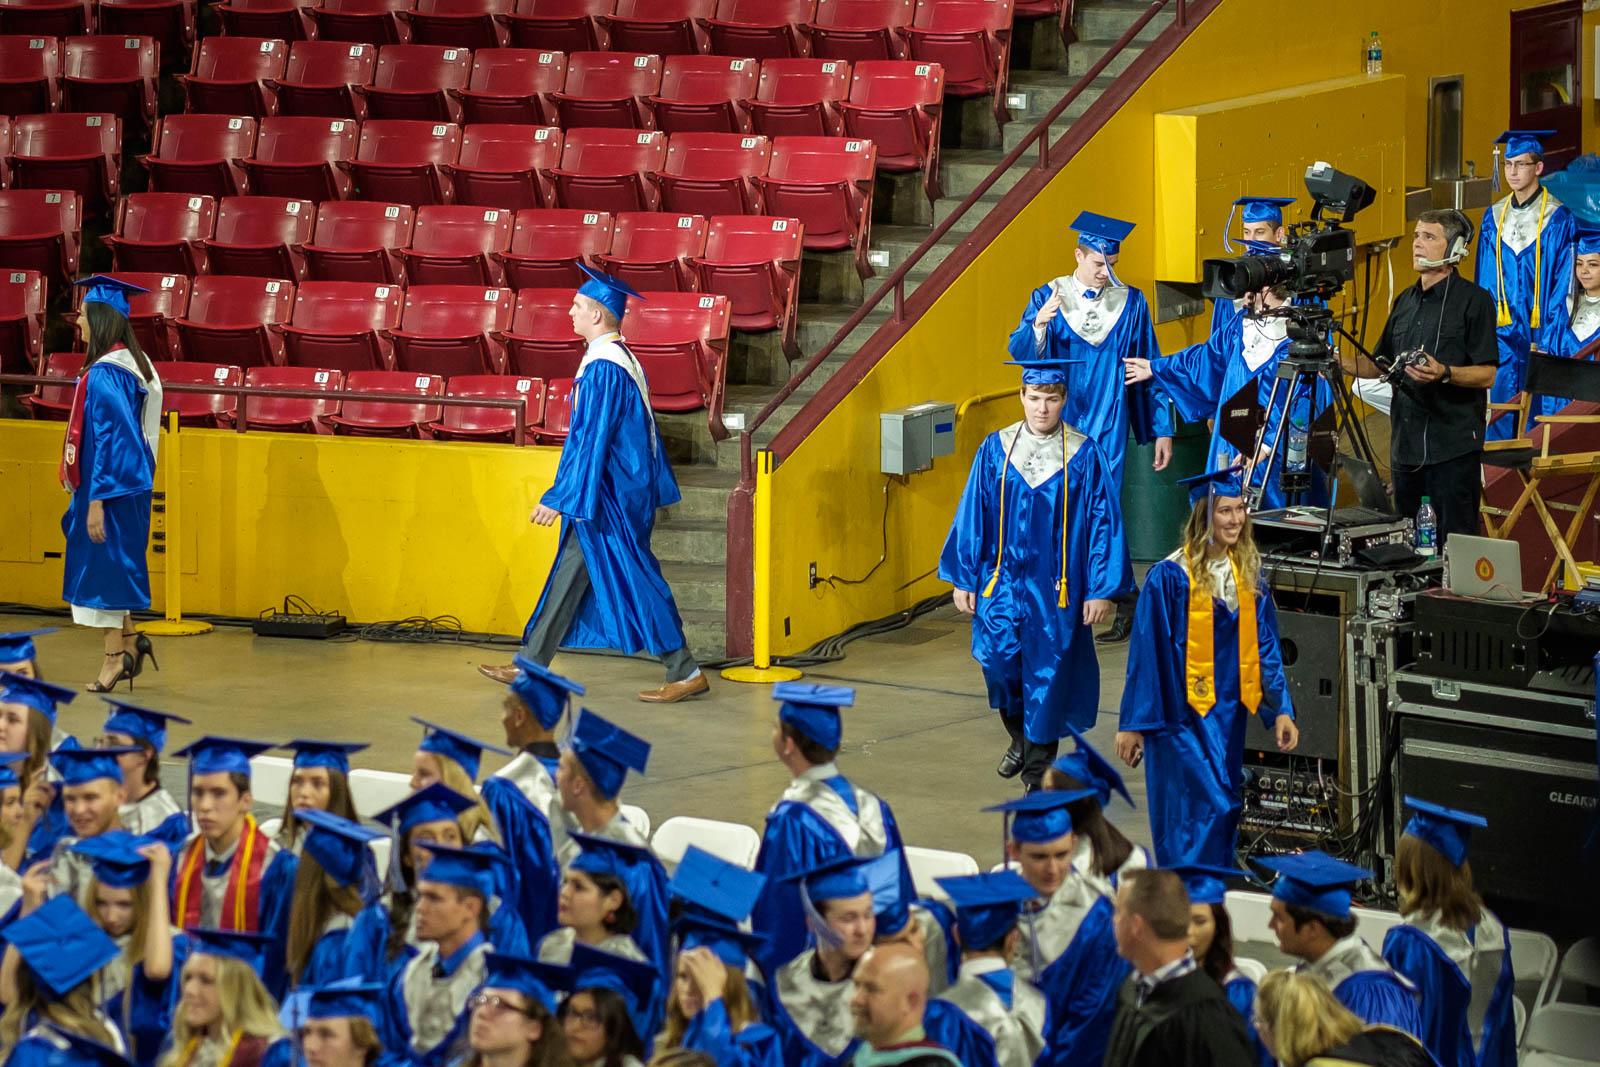 Matthew's high school graduation from Mesquite H.S. in Gilbert, Arizona